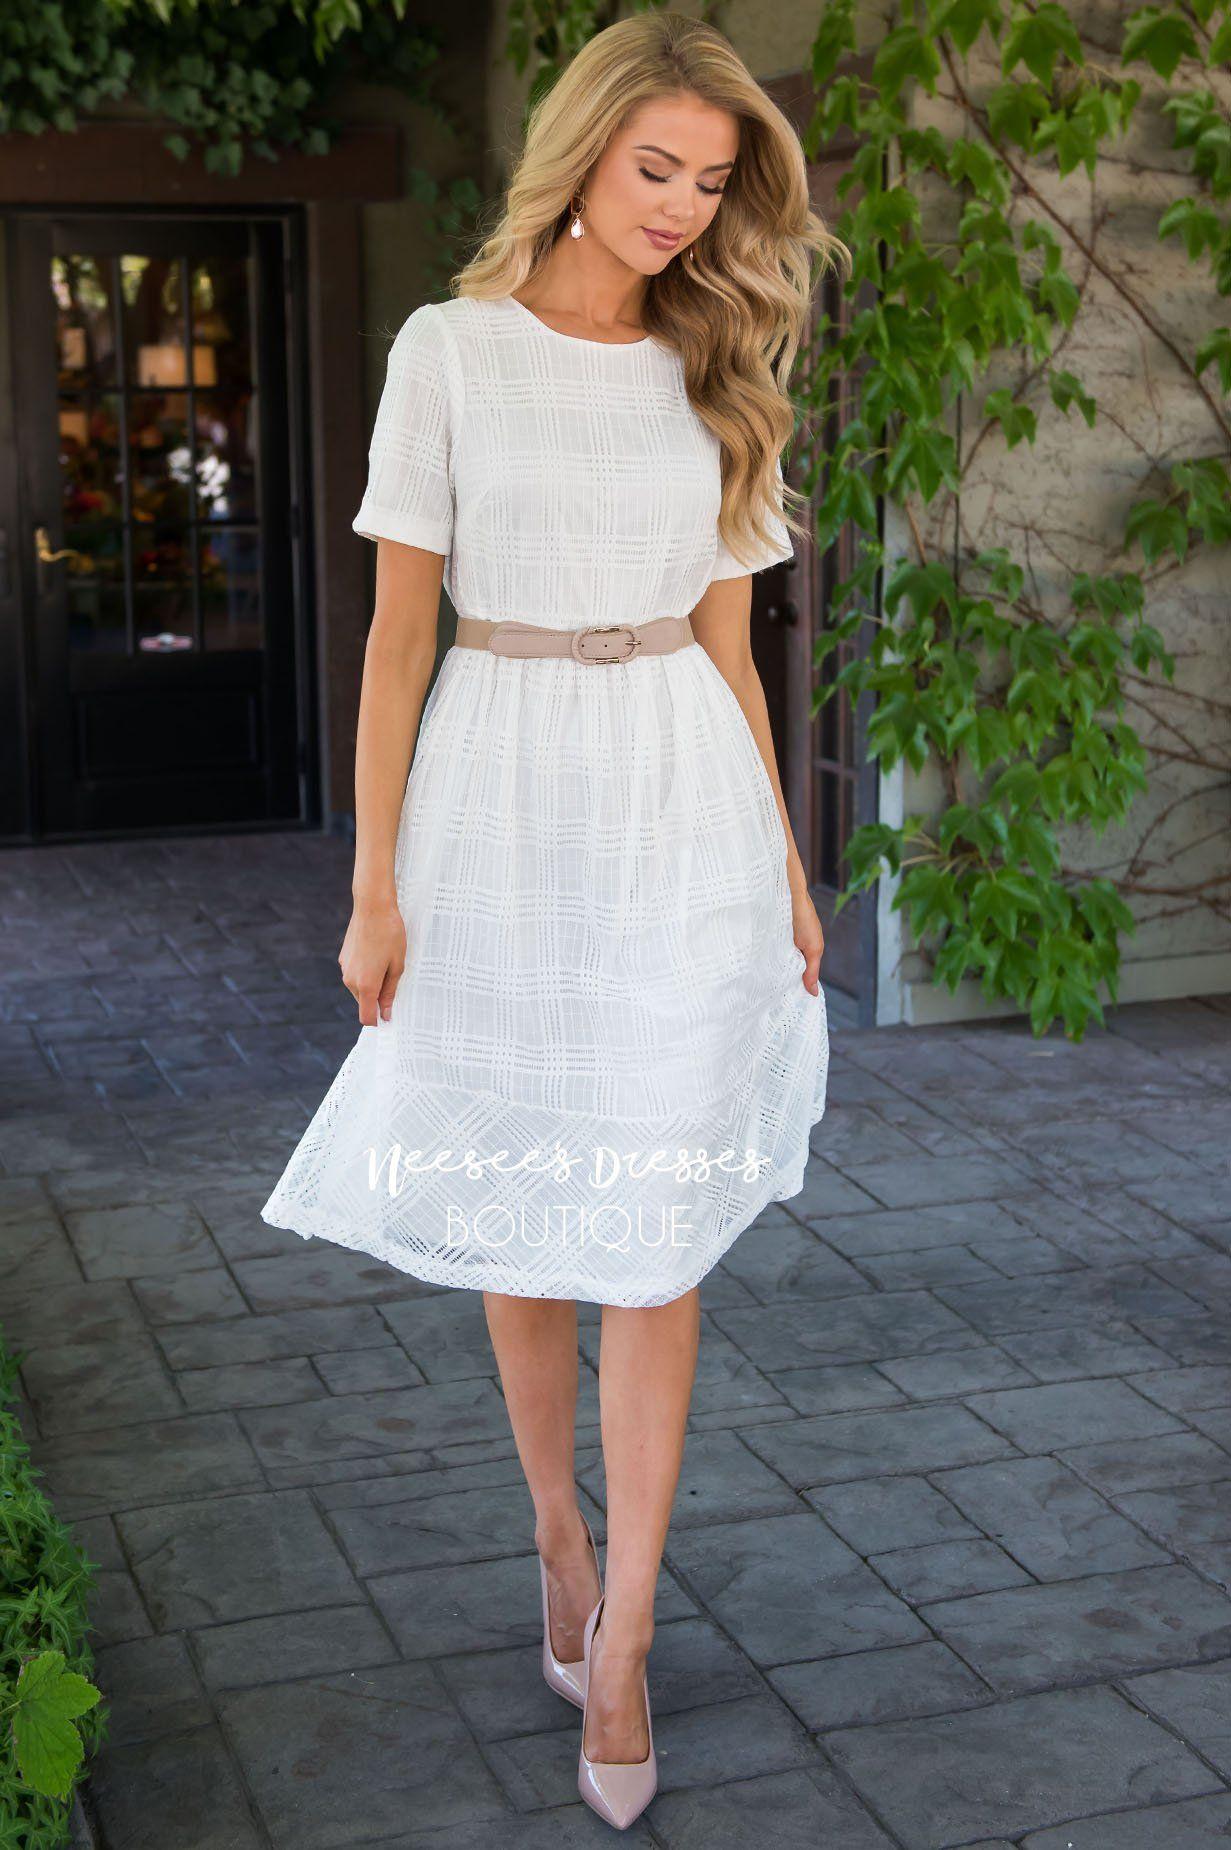 White Lace Overlay Dress Modest Dress Best Place To Buy Modest Dress Online Modest Dresses And Skirts Neesees Dresses Lace Overlay Dress Fitted Lace Dress [ 1850 x 1231 Pixel ]